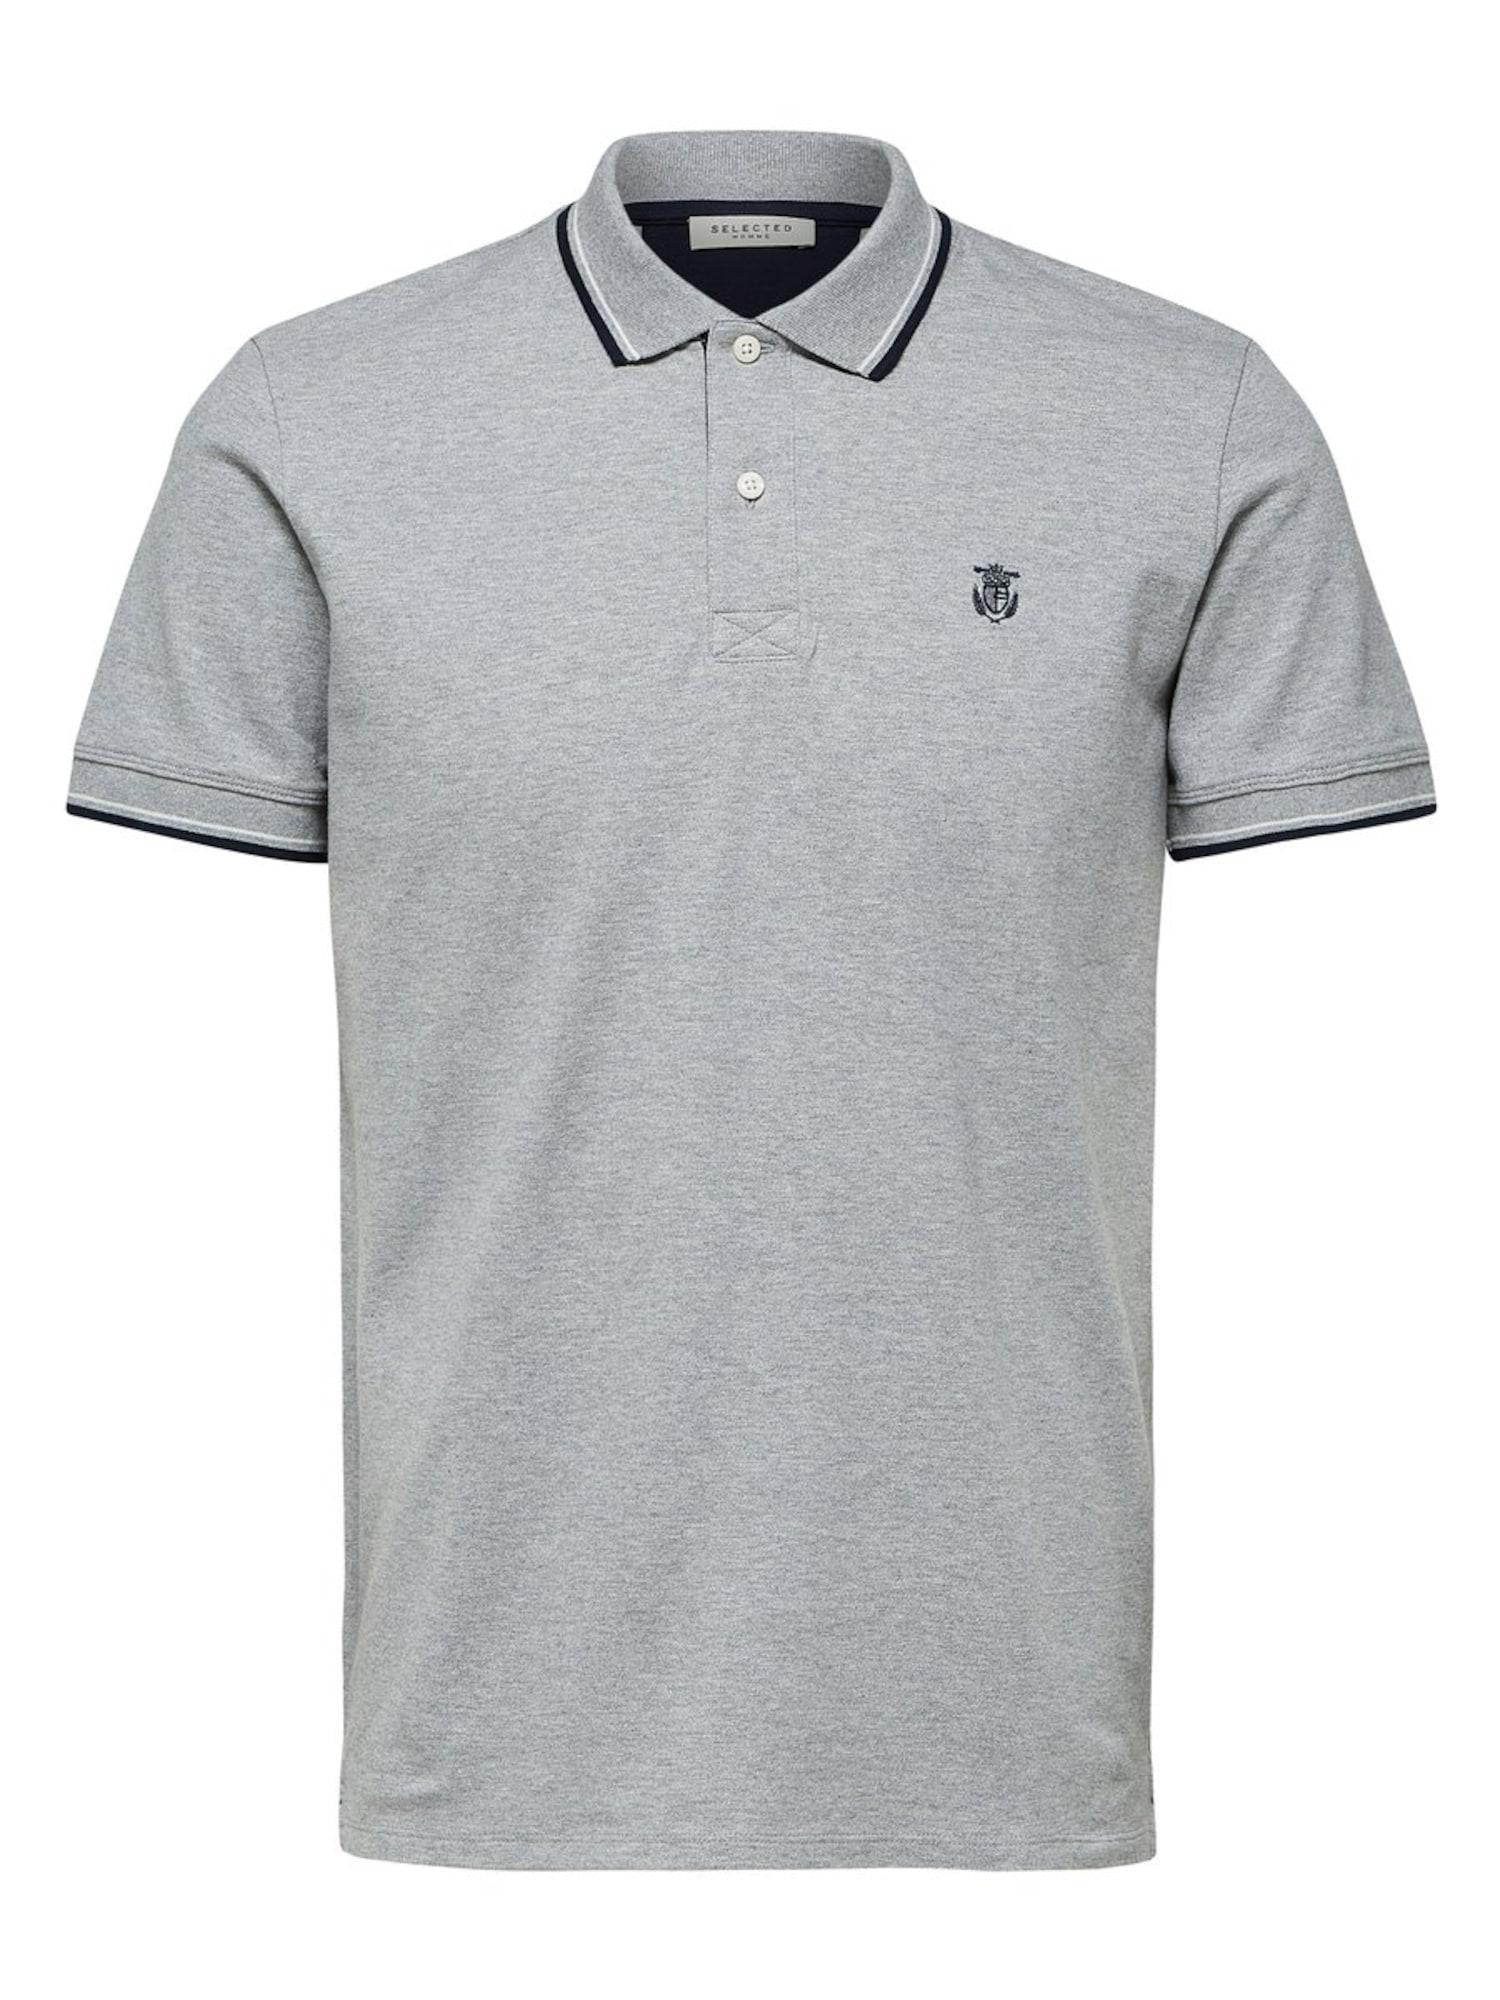 SELECTED HOMME Marškinėliai pilka